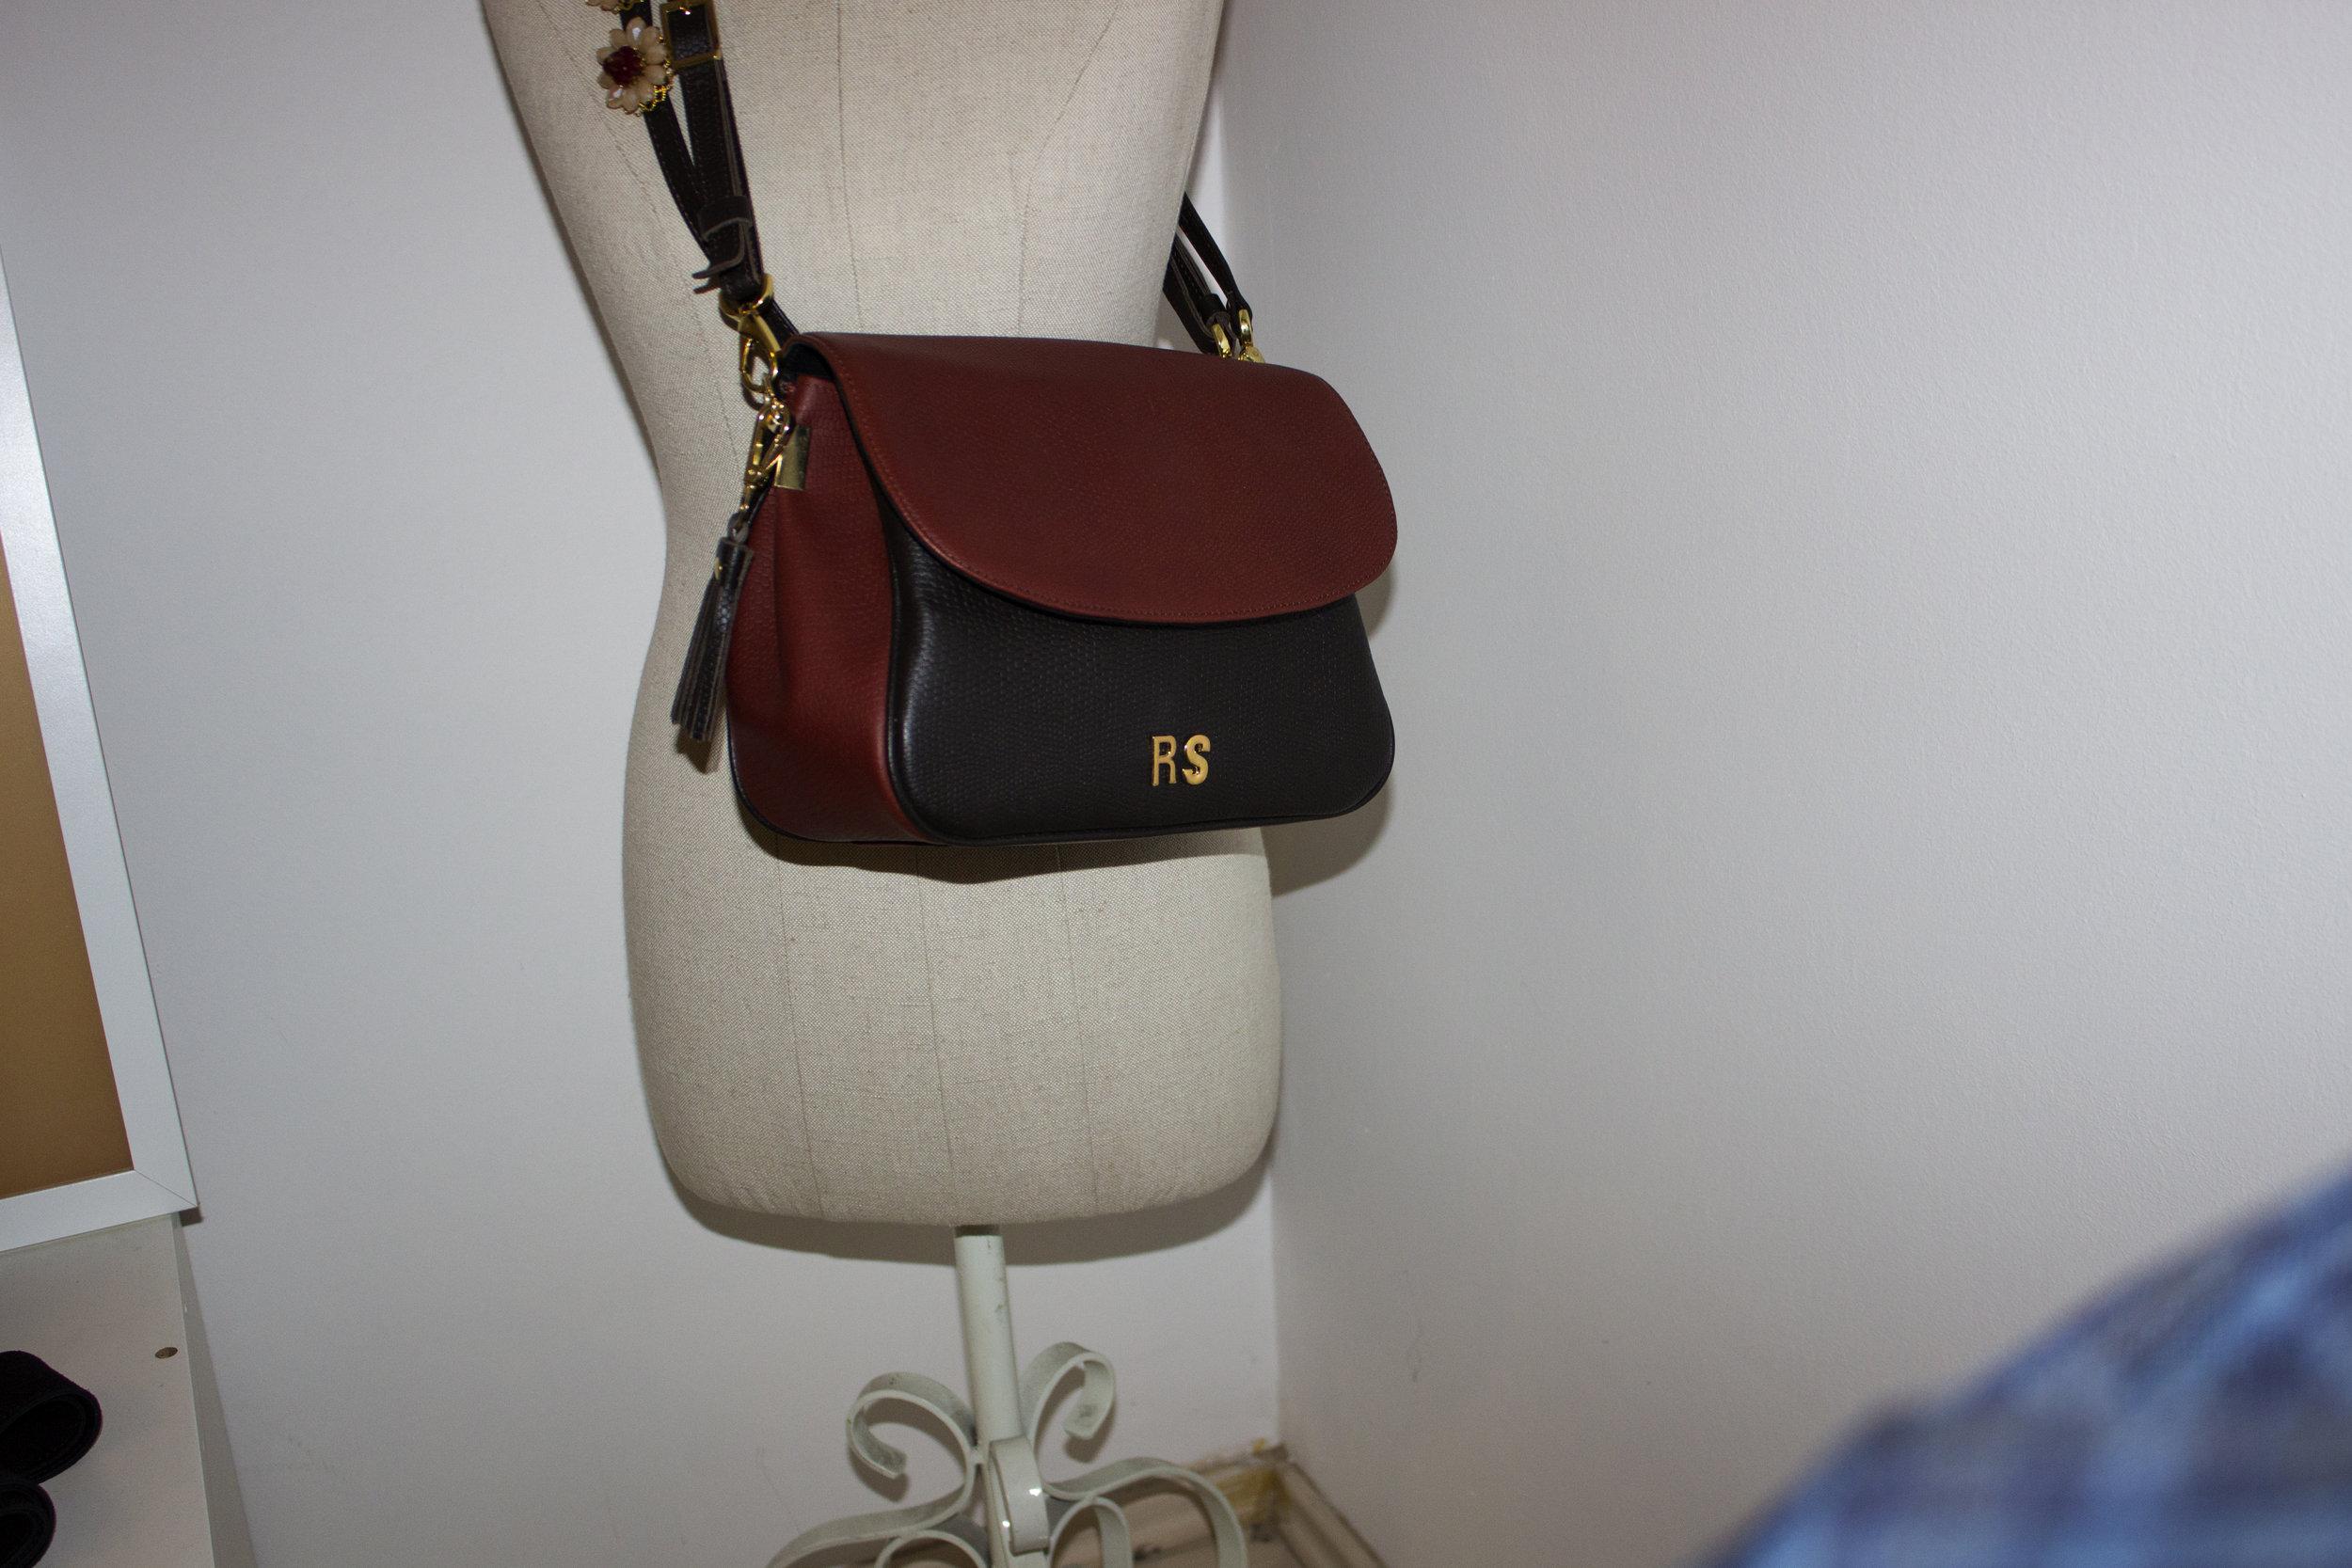 robert-sever-kristina-showroom-croatian-designer-expensive-reality-bipa-fashion-hr (1).jpg